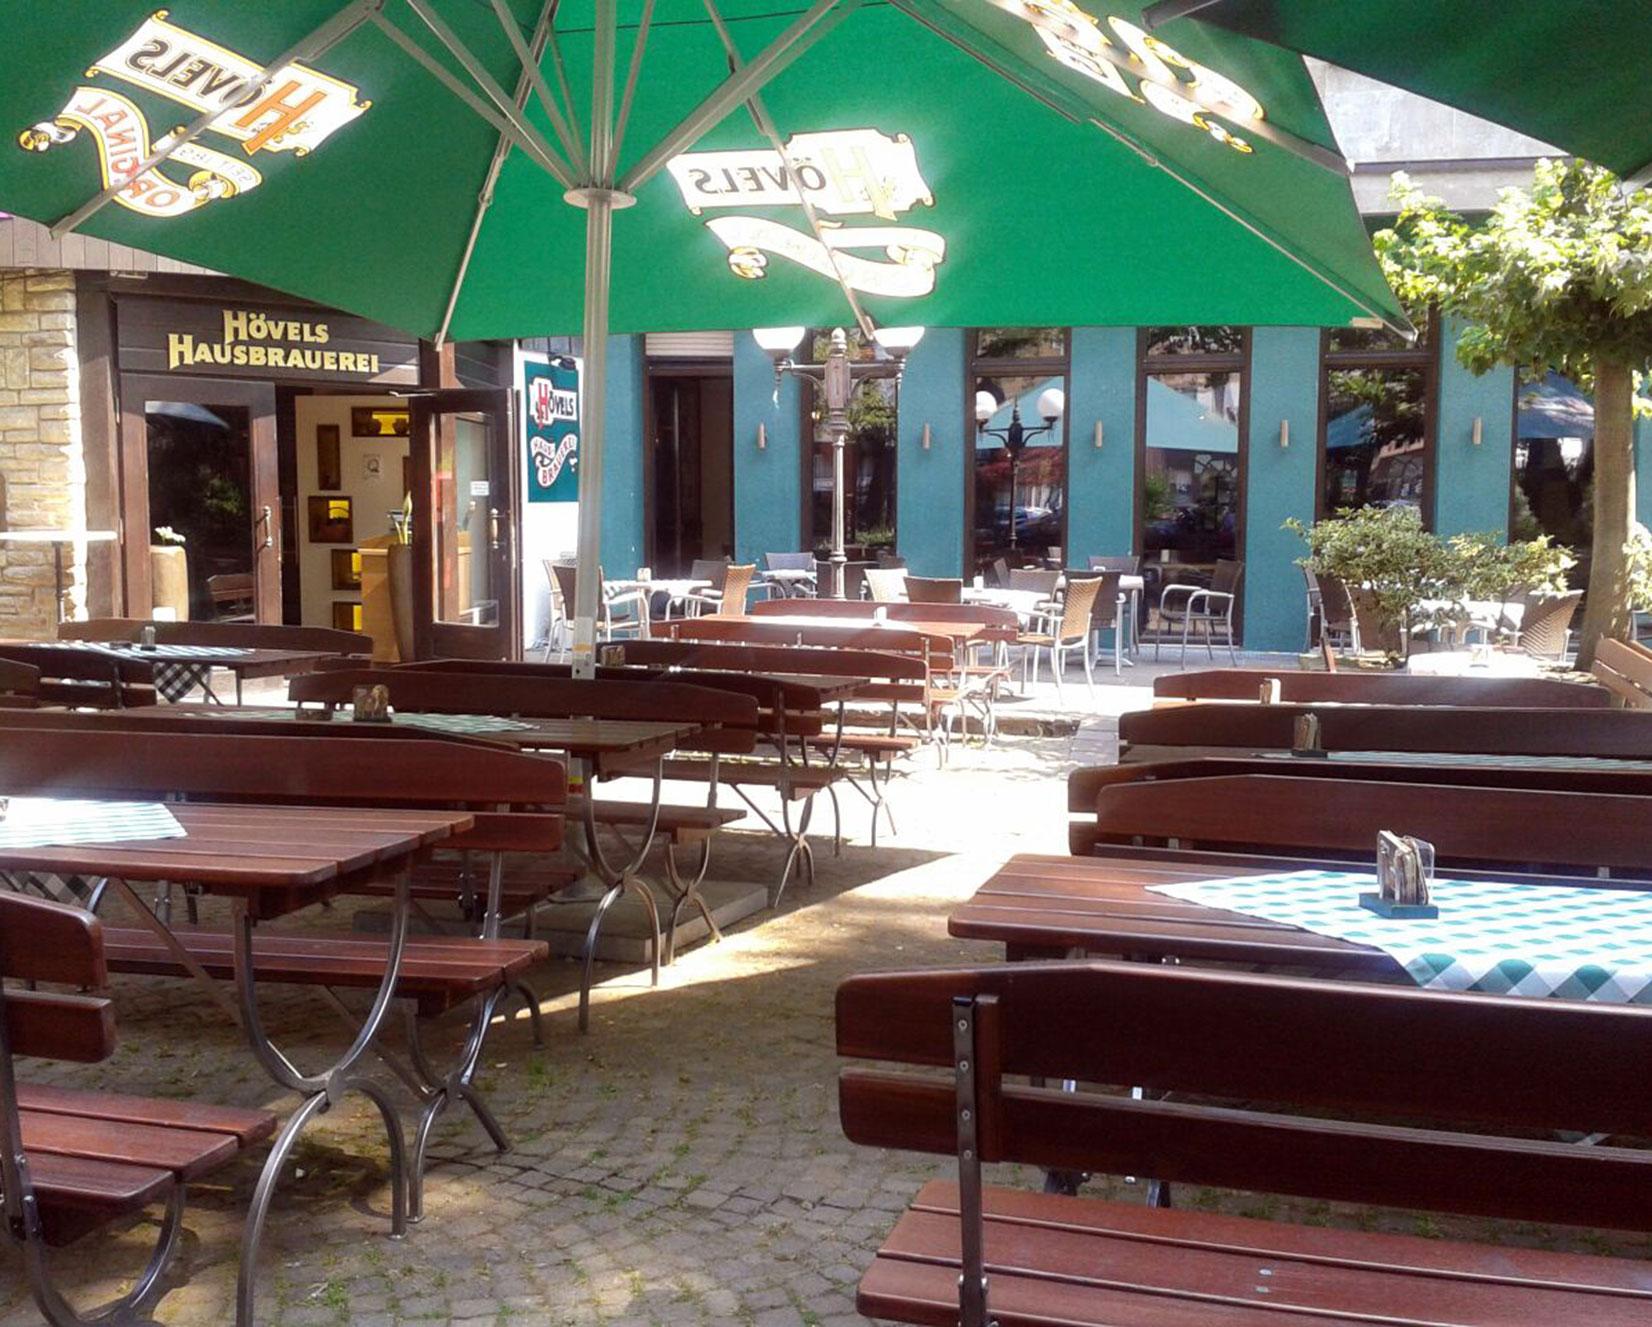 Biergarten Dortmunder Innenstadt - Hövels Hausbrauerei